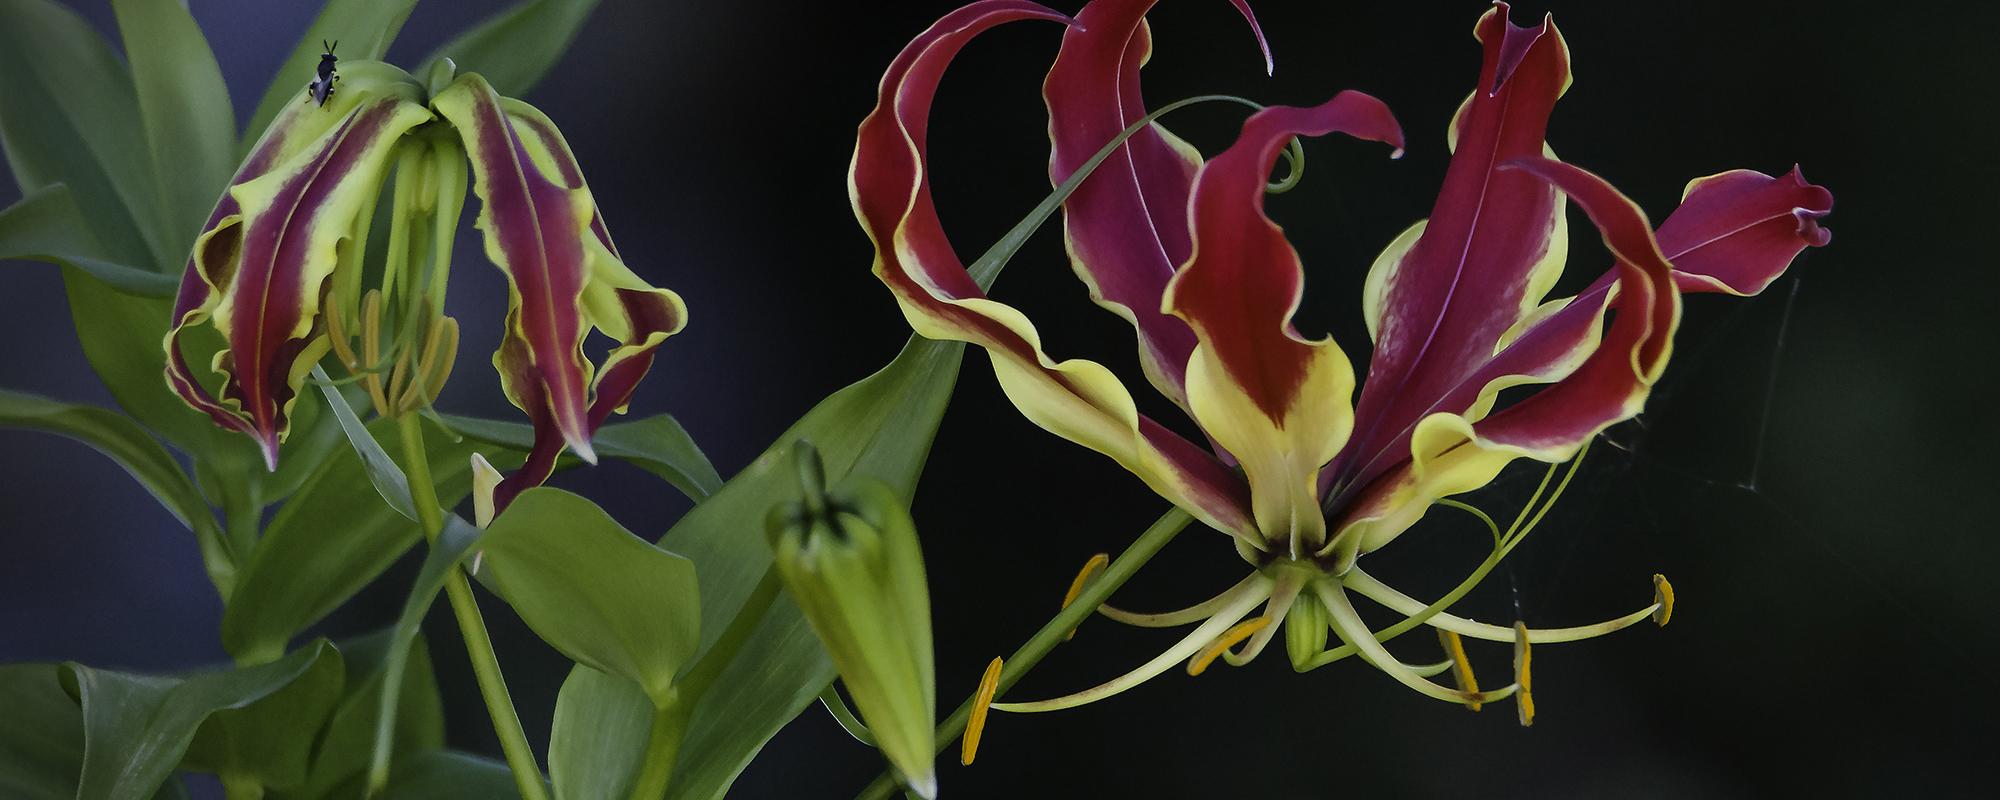 Copy of Copy of Gloriosa Lilies